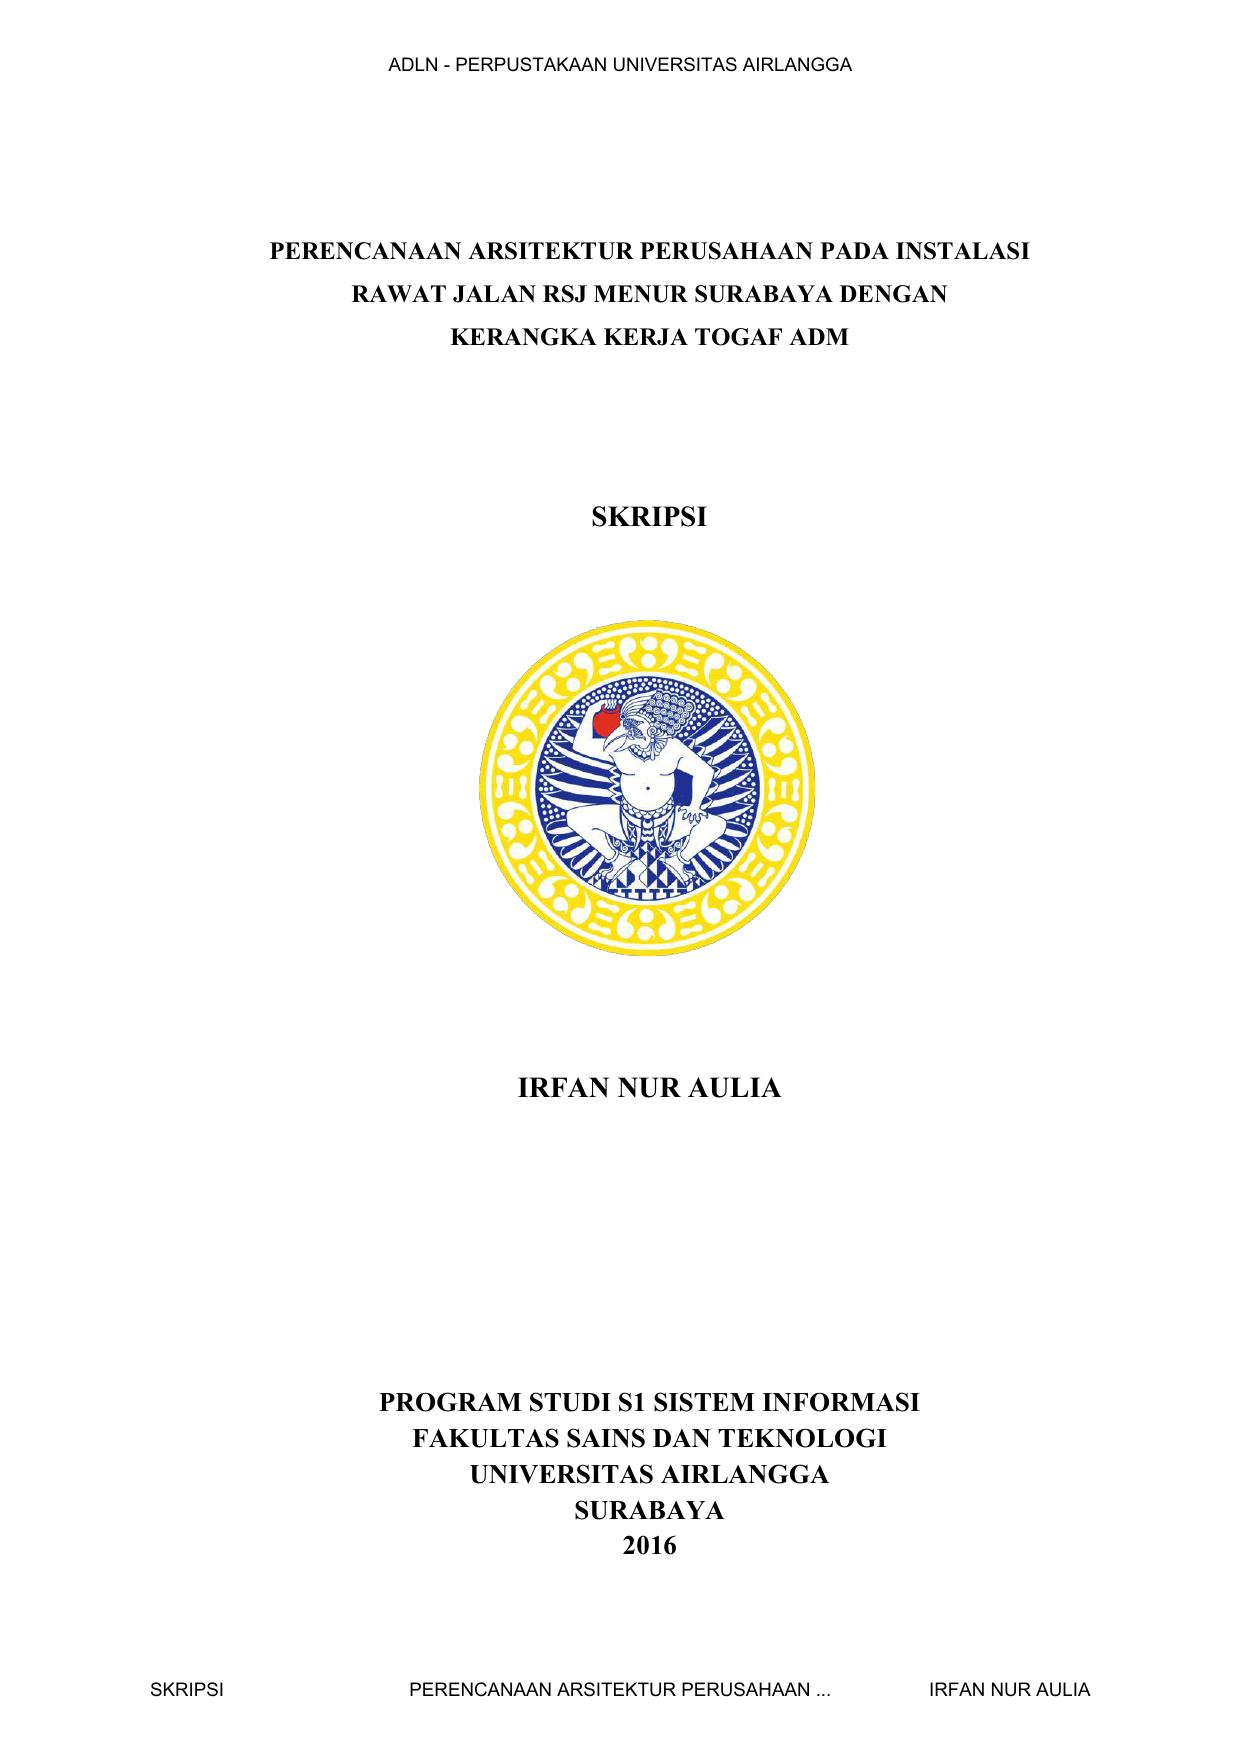 Skripsi Irfan Nur Aulia Unair Repository